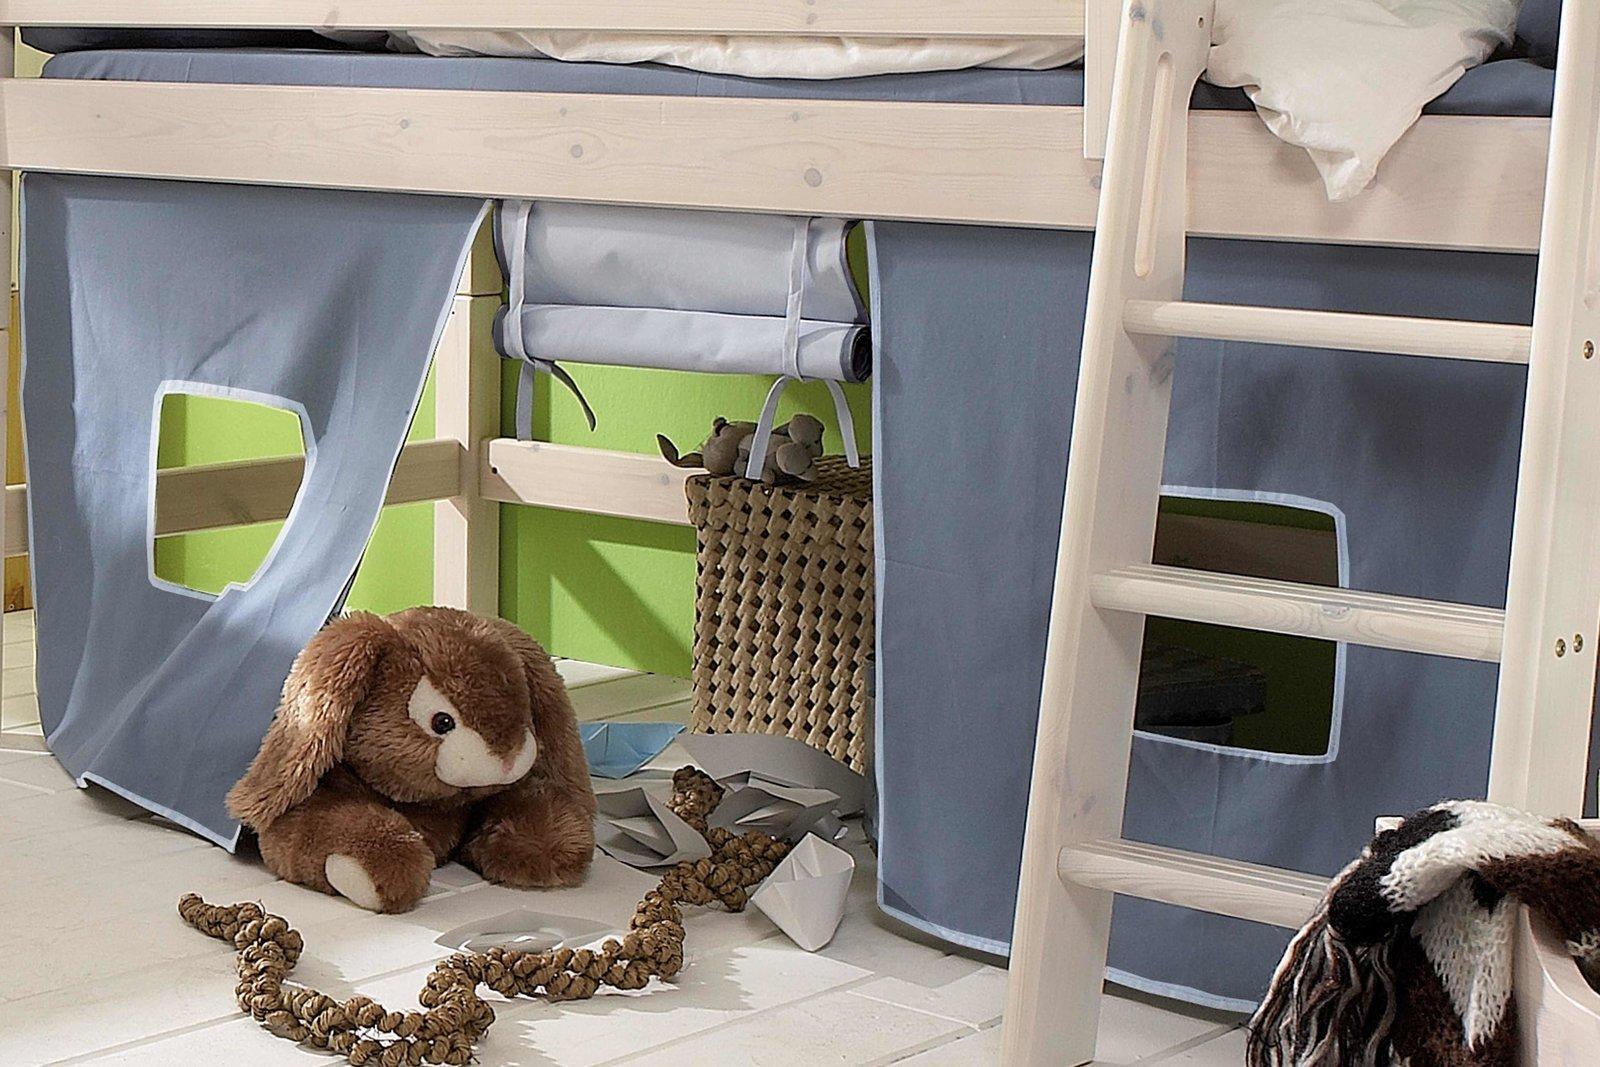 InfansKids Kinderzimmer Tiset, Bild 5